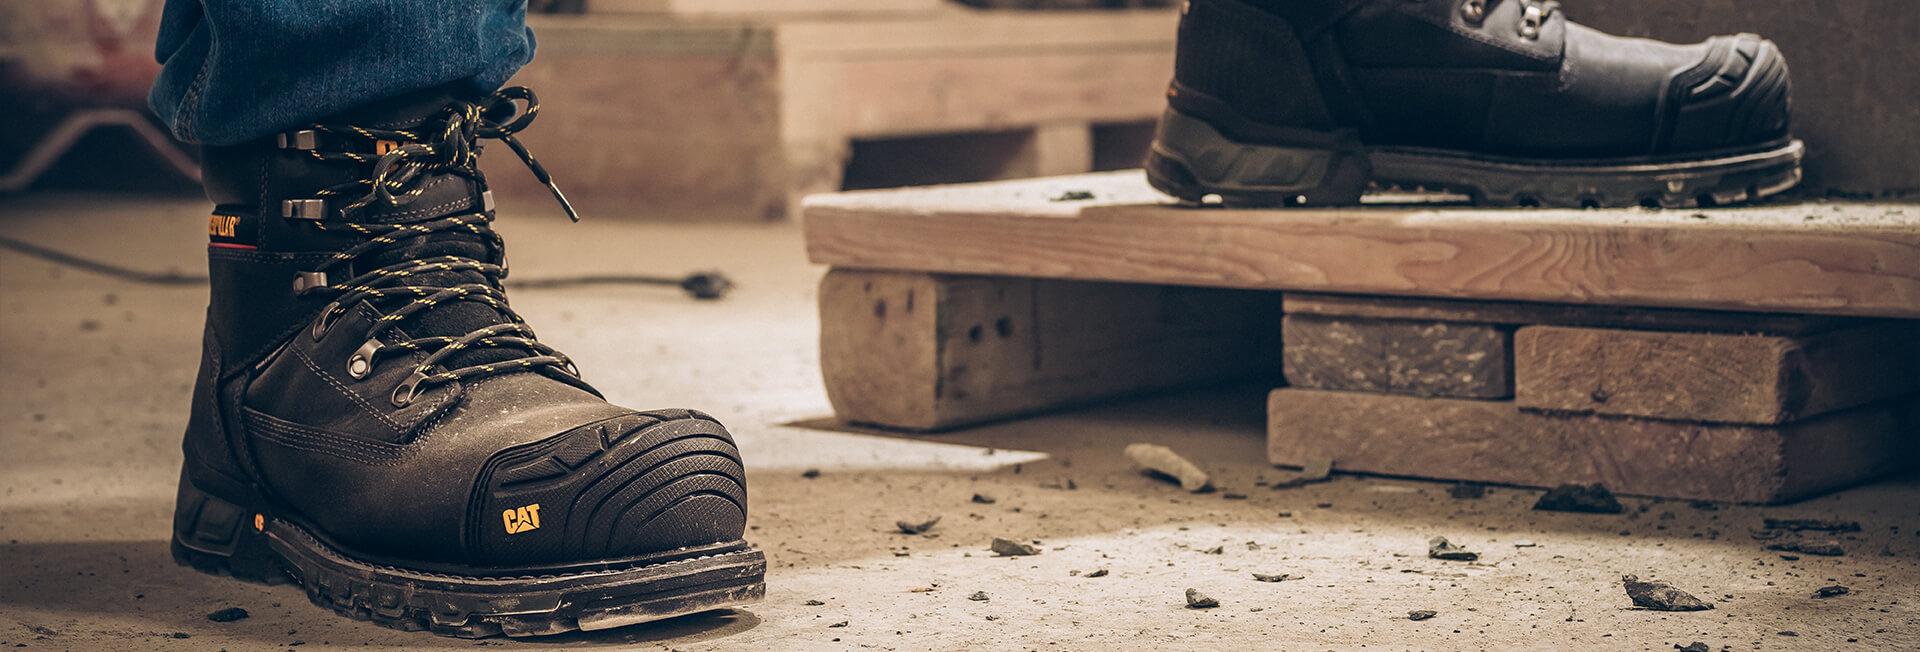 Men's Work Boots - Shop Work Shoes For Men | Cat Footwear